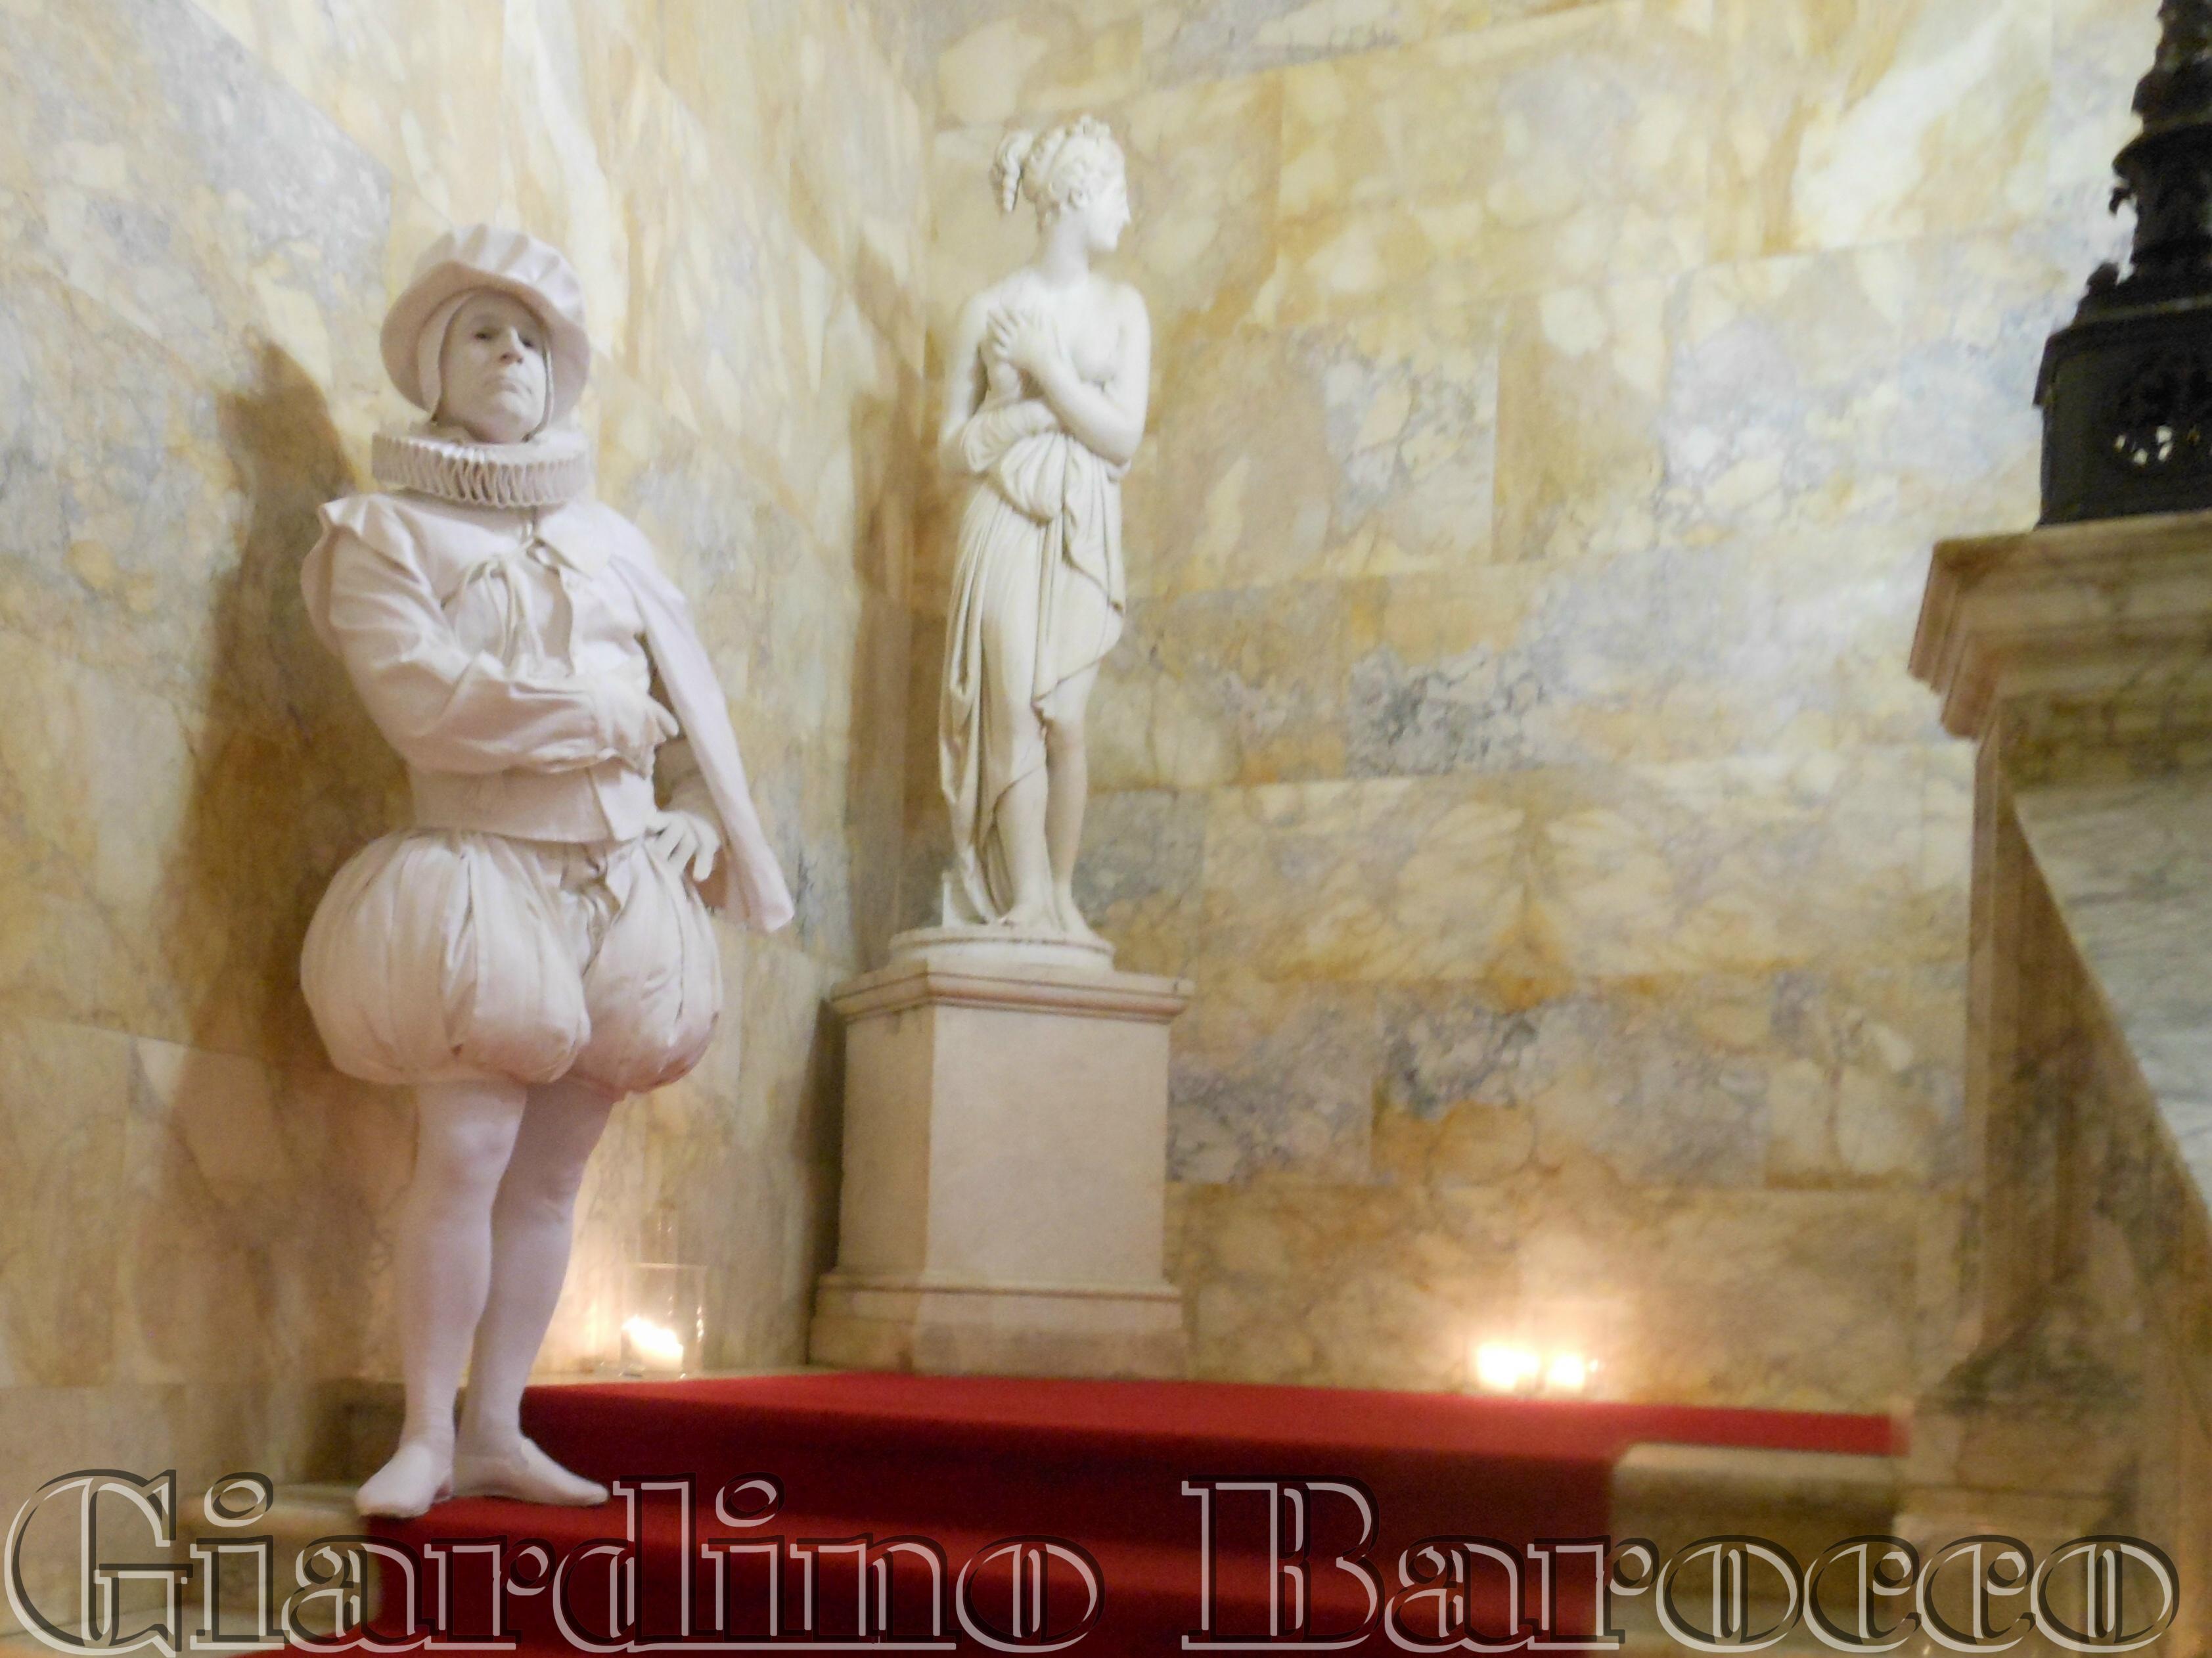 Giardino Barocco - Shakespeare